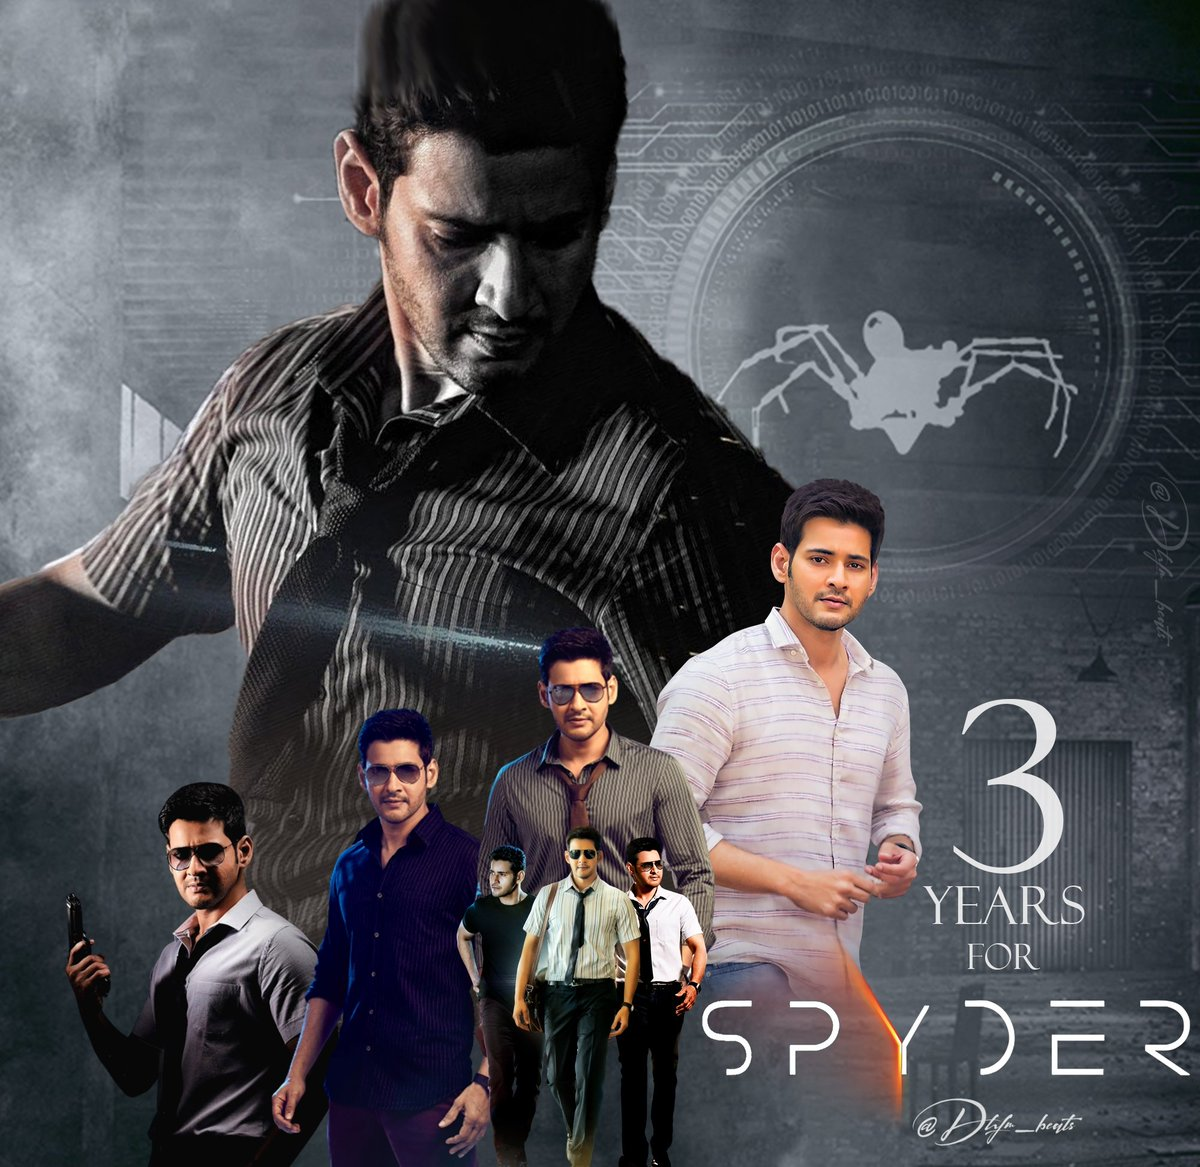 Superstar   @urstrulyMahesh #Spyder completes 3 years  @ARMurugadoss @Rakulpreet @sonymusic @SpyderTheMovie  #MaheshBabu #3YearsForSPYder https://t.co/sriMONWaRg